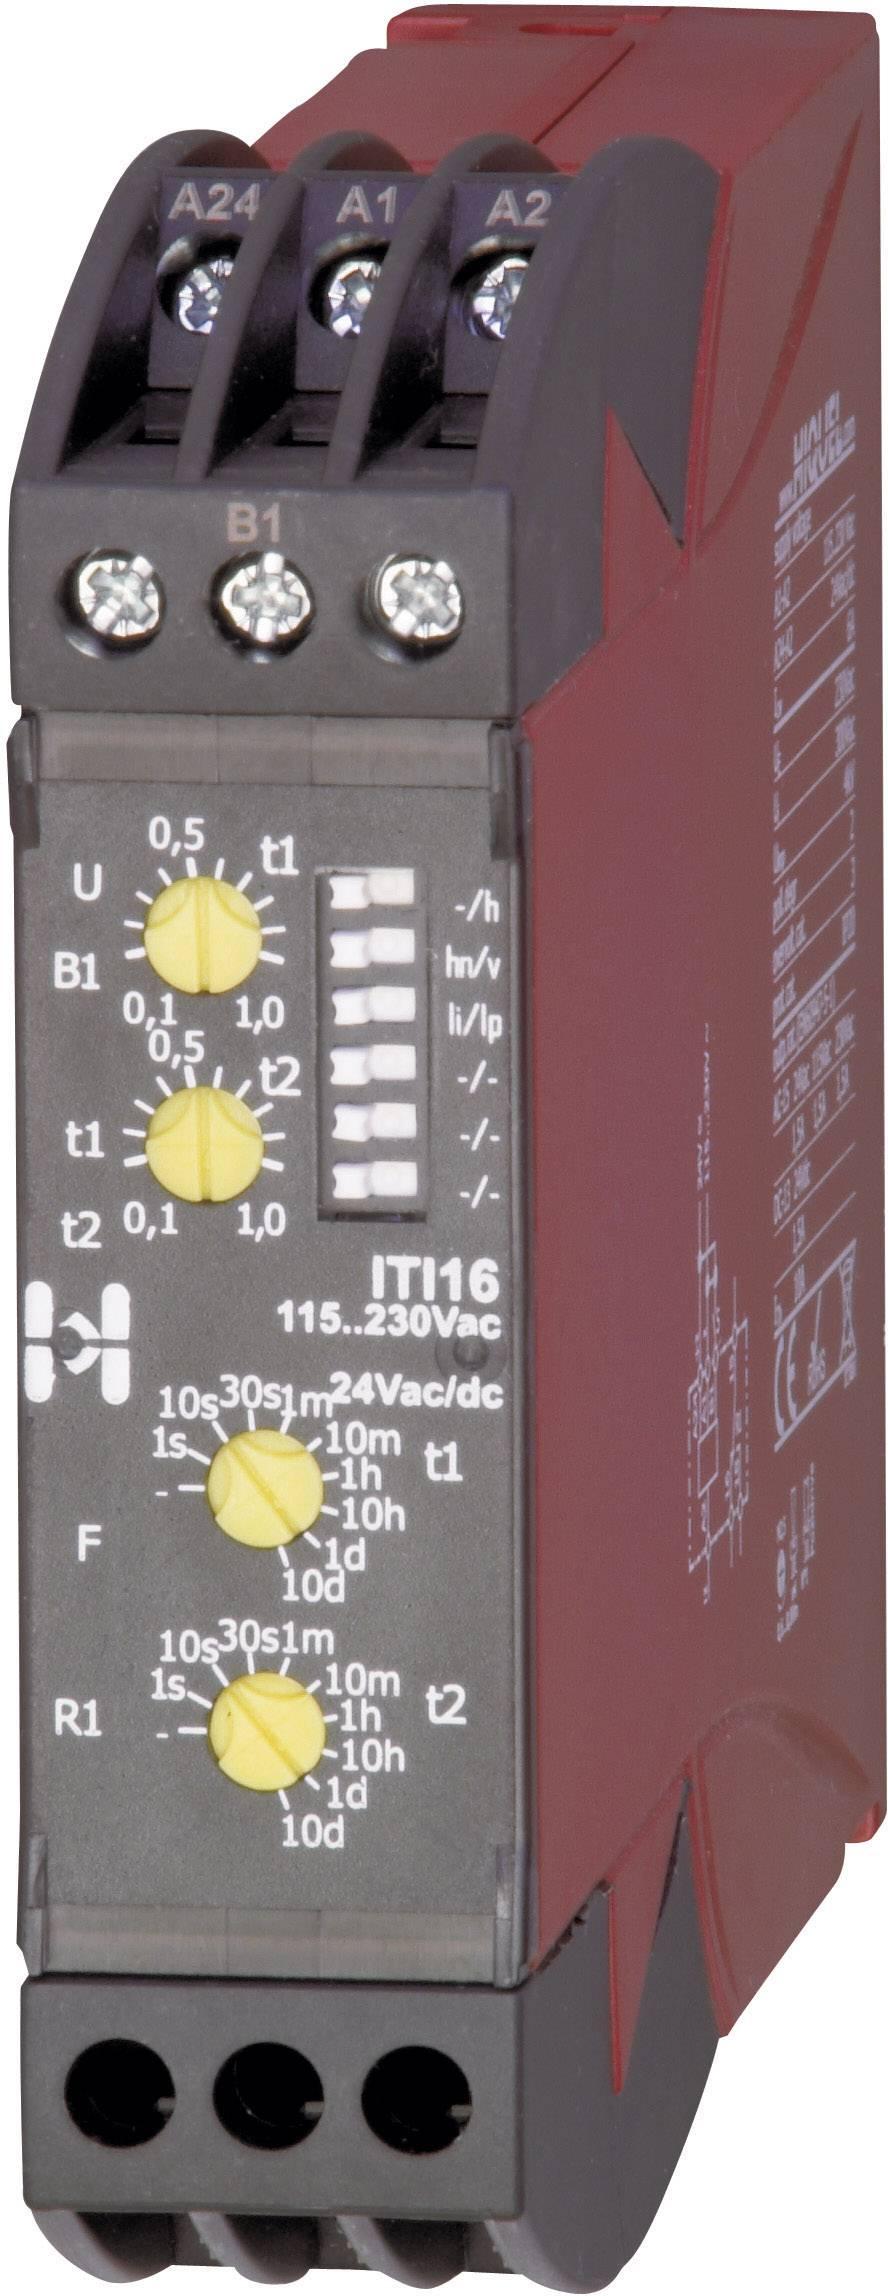 Hiquel in-case ITI 16